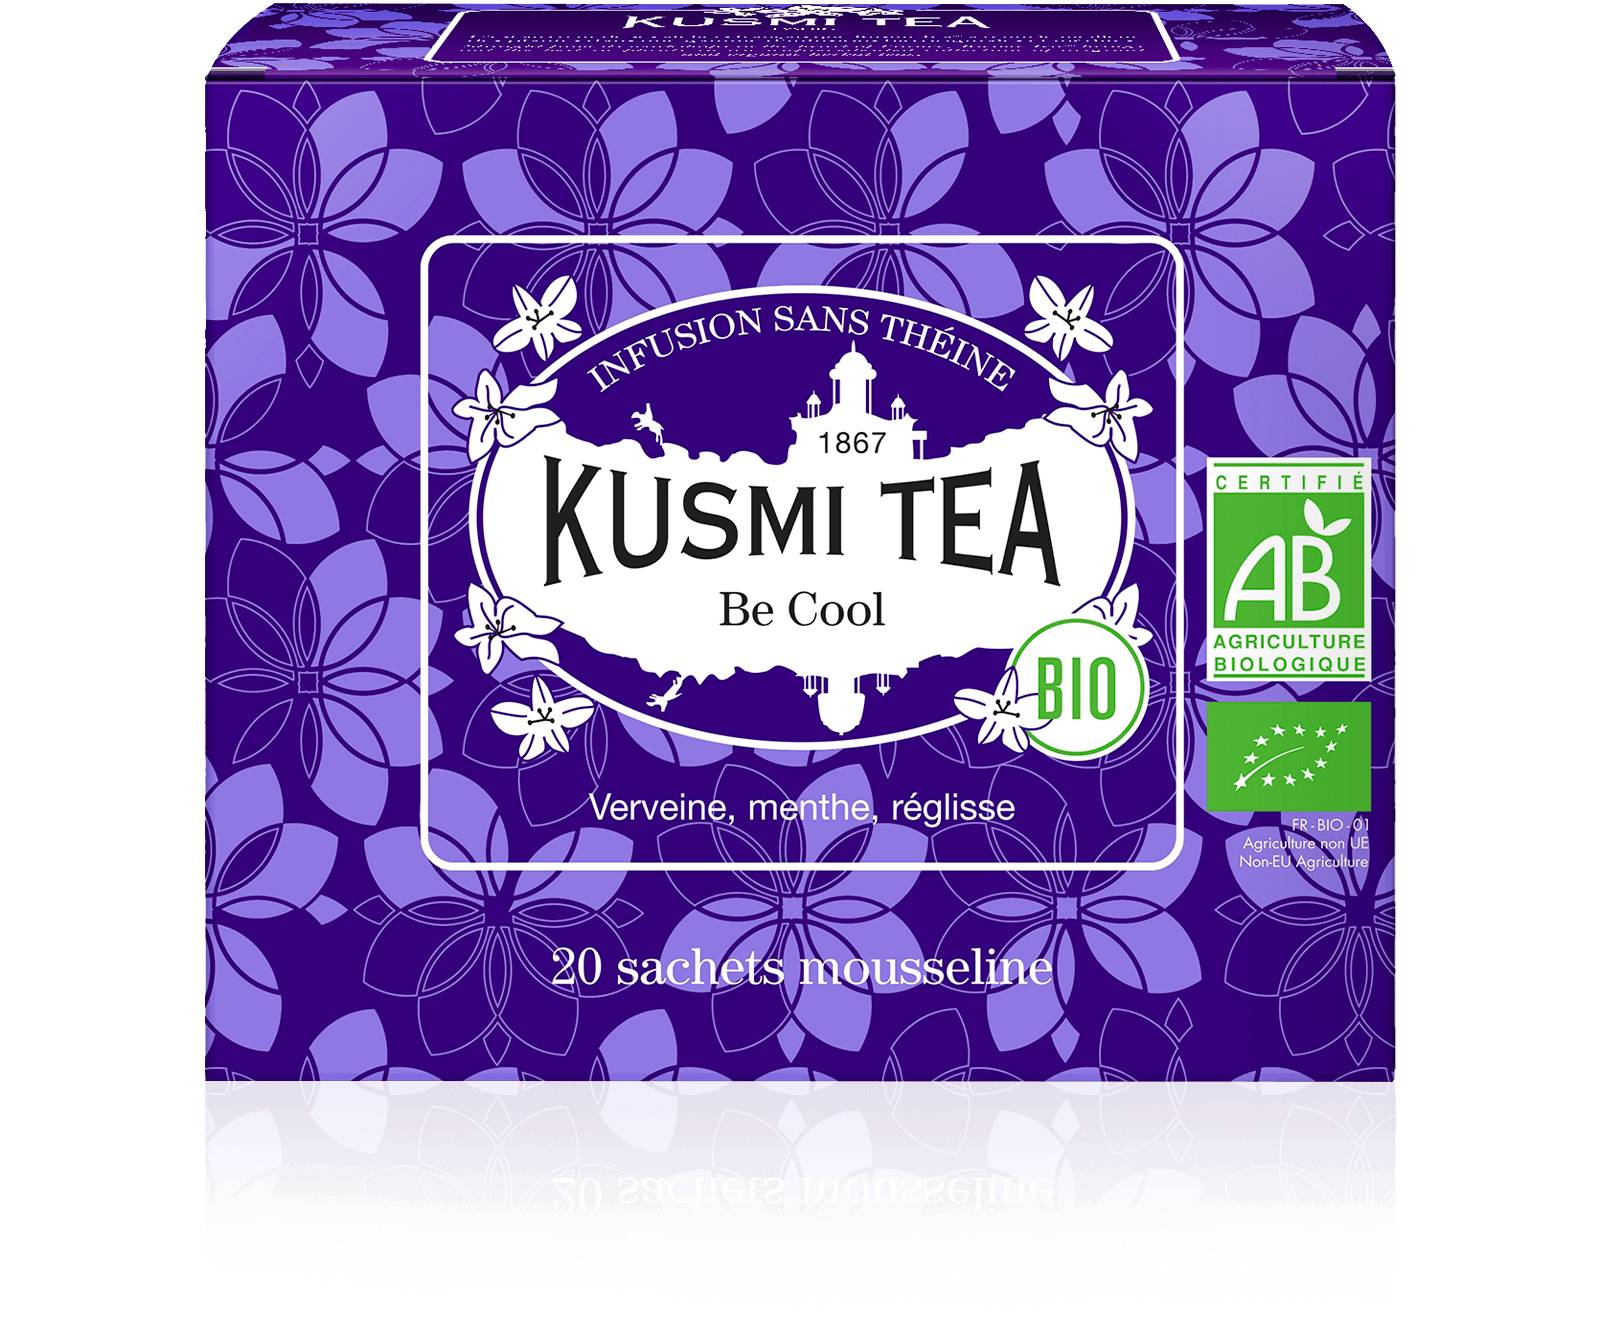 KUSMI TEA Be Cool bio - Infusion verveine - Sachets de thé - Kusmi Tea